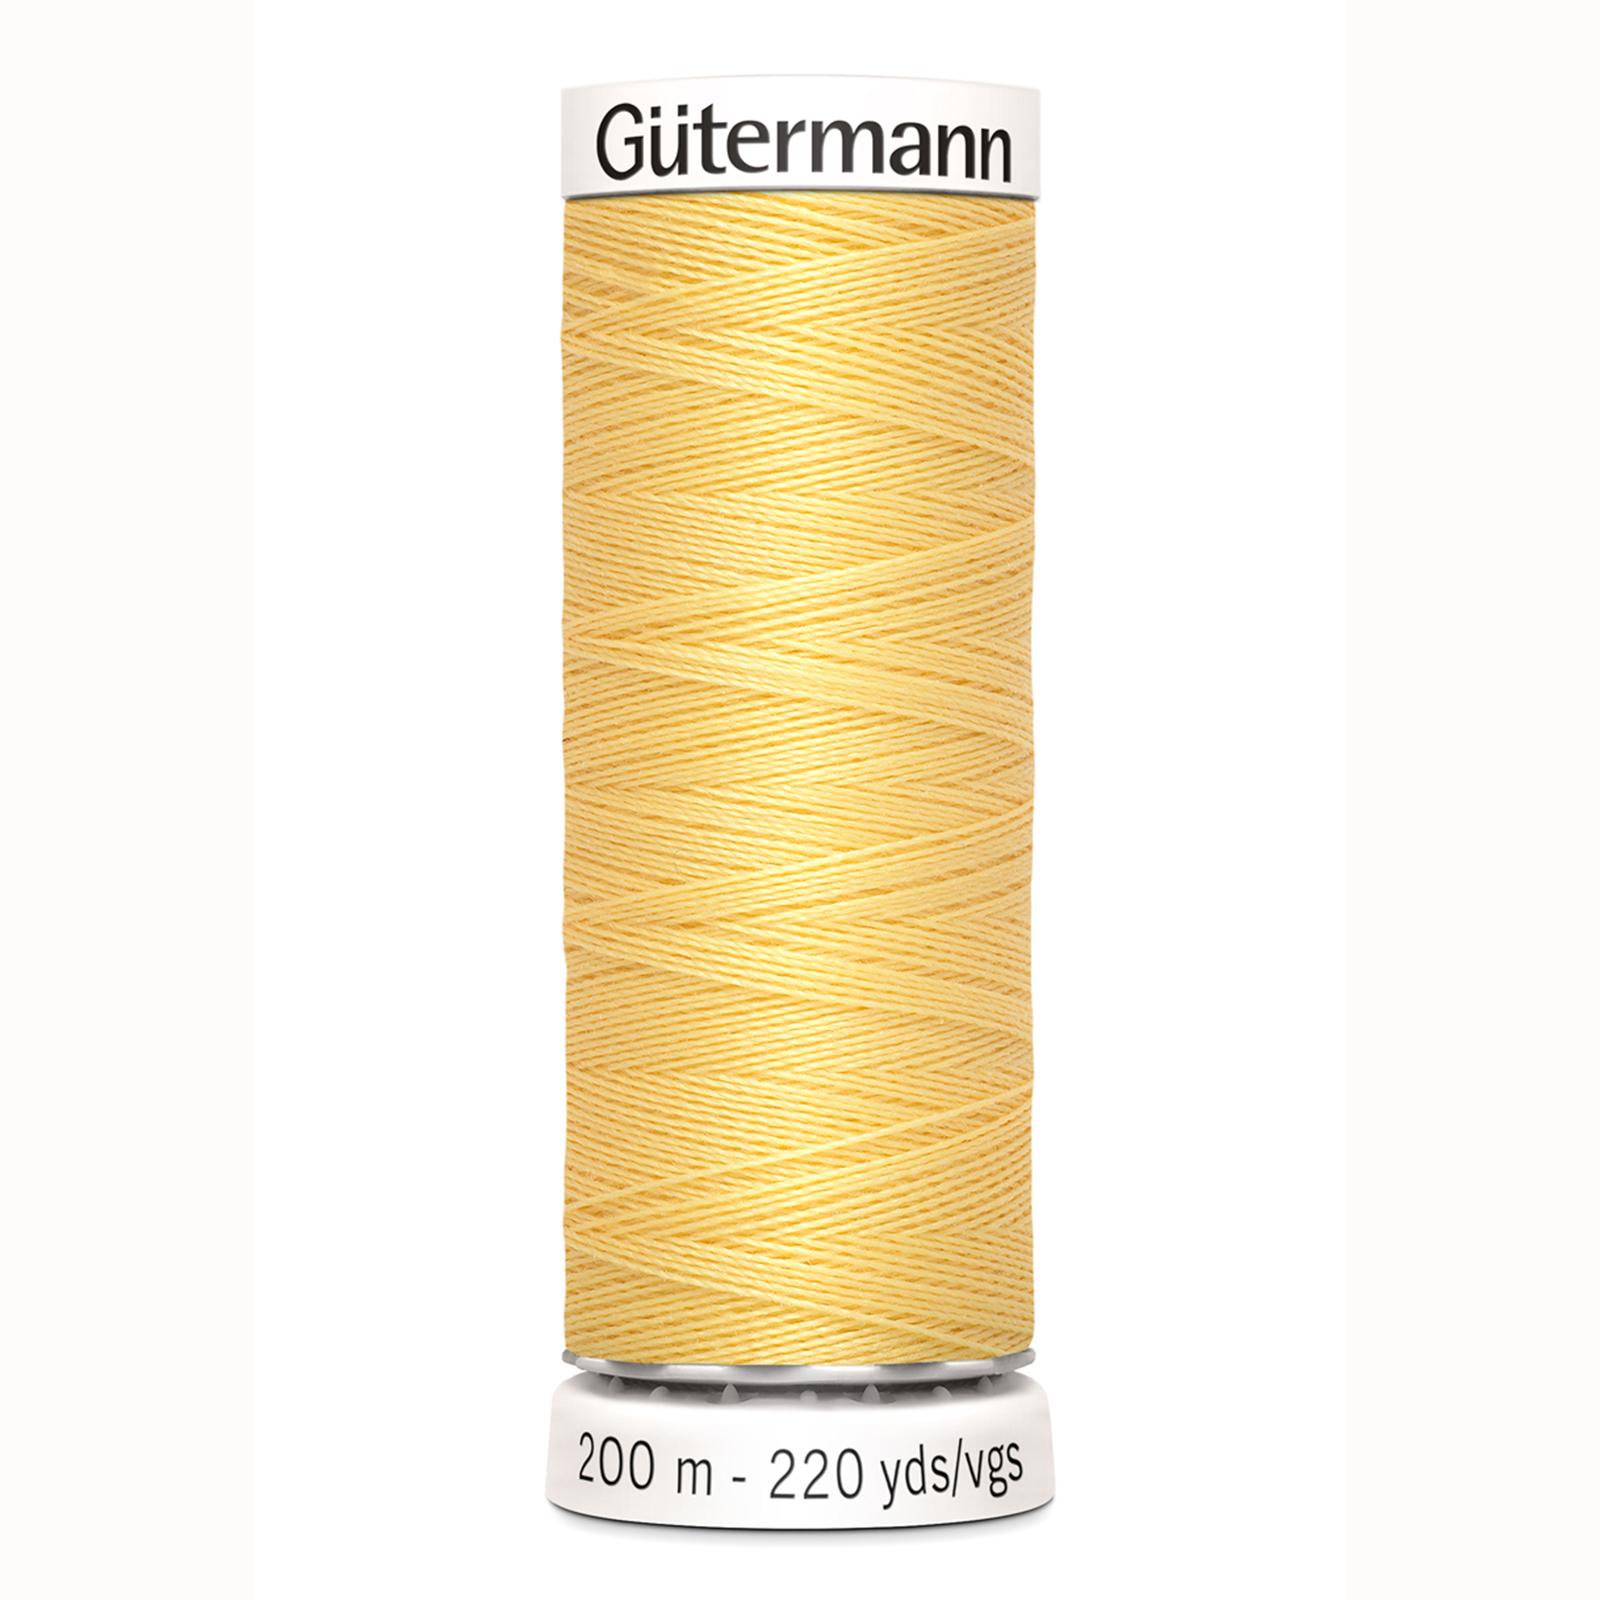 Gutermann Polyestr 200m-7